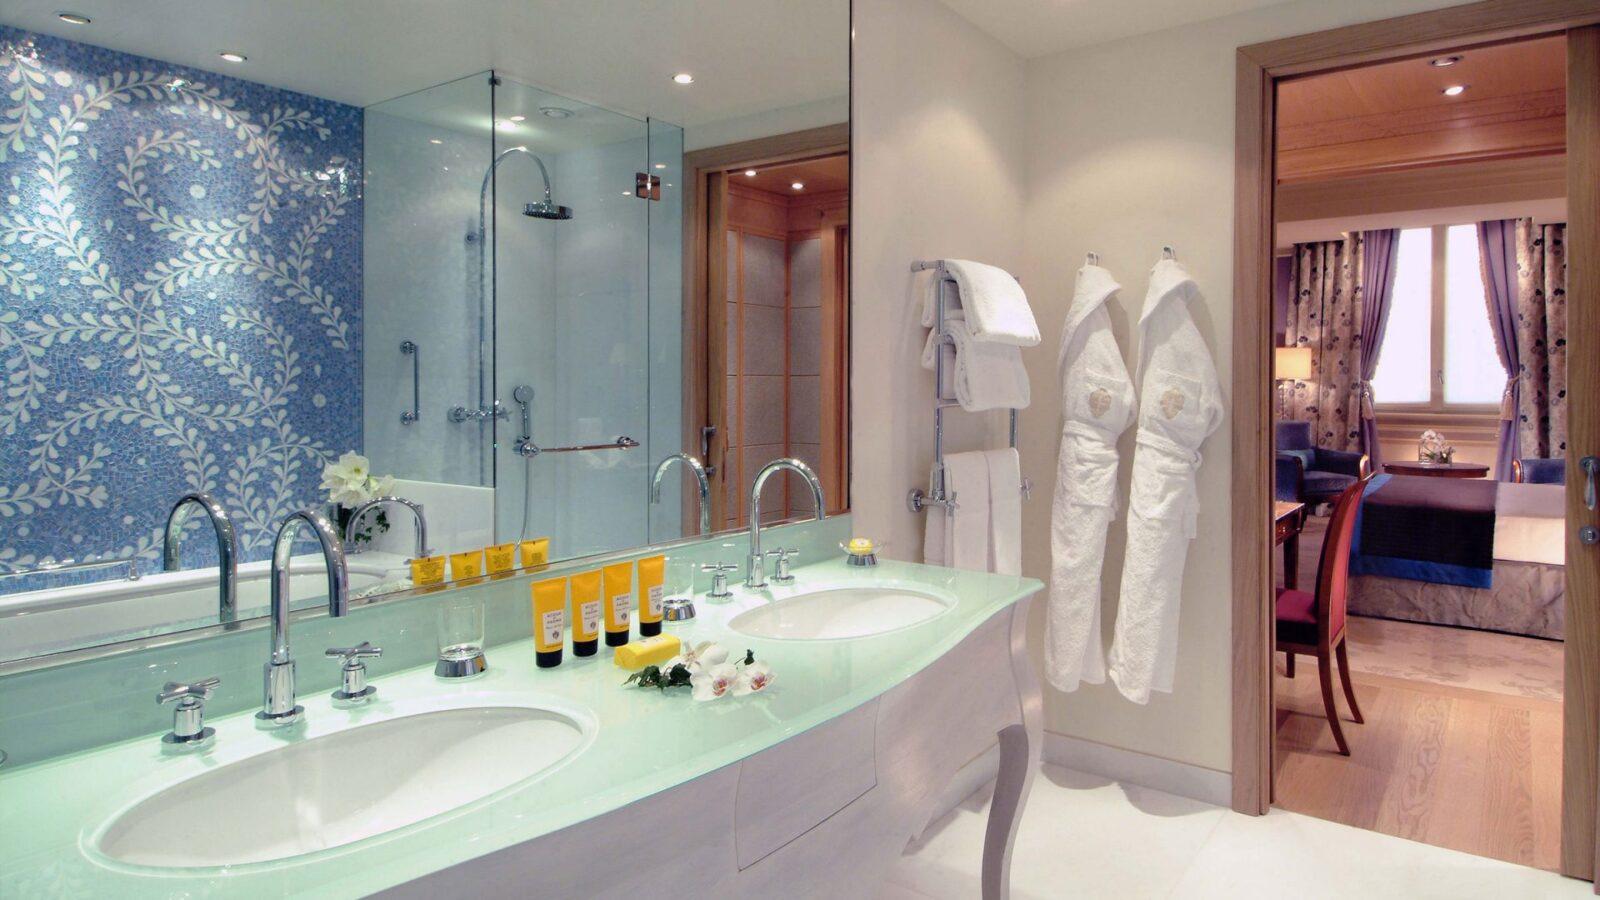 Mosaic Room bathroom at Hotel Principe di Savoia